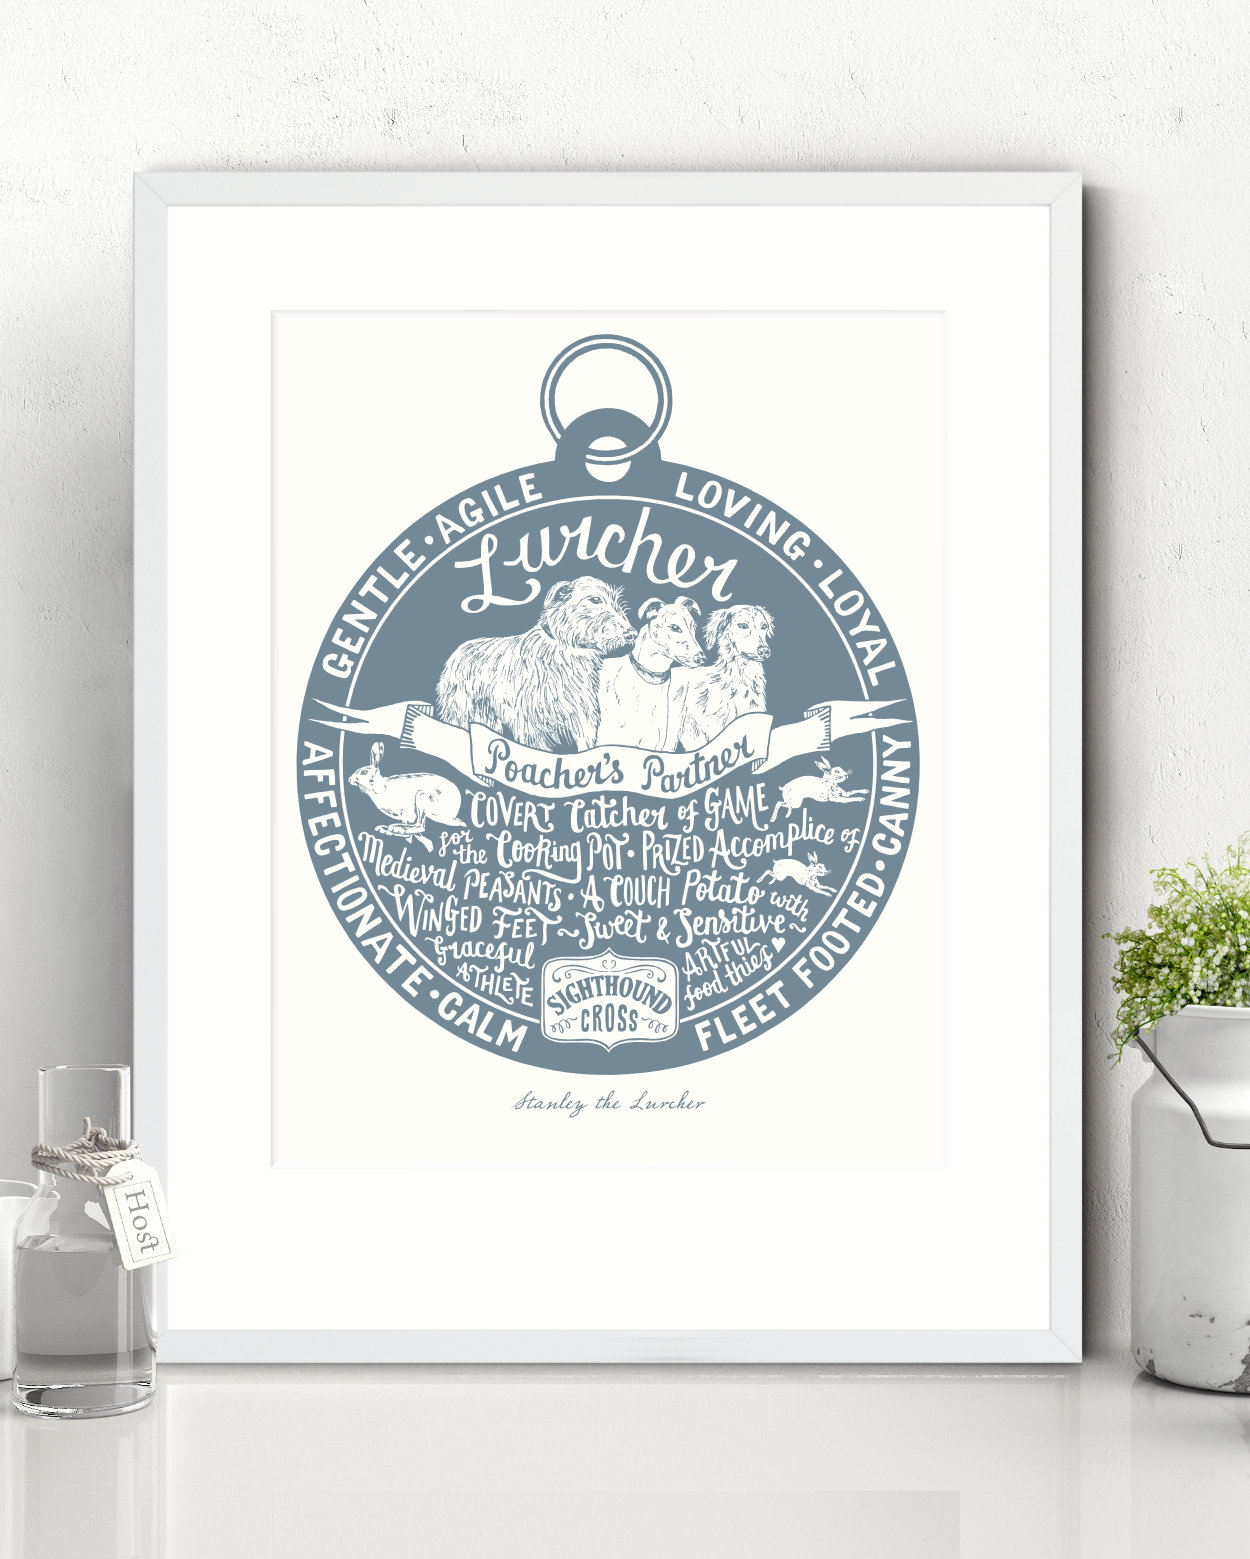 Lurcher Illustrated Art Print | The Enlightened Hound